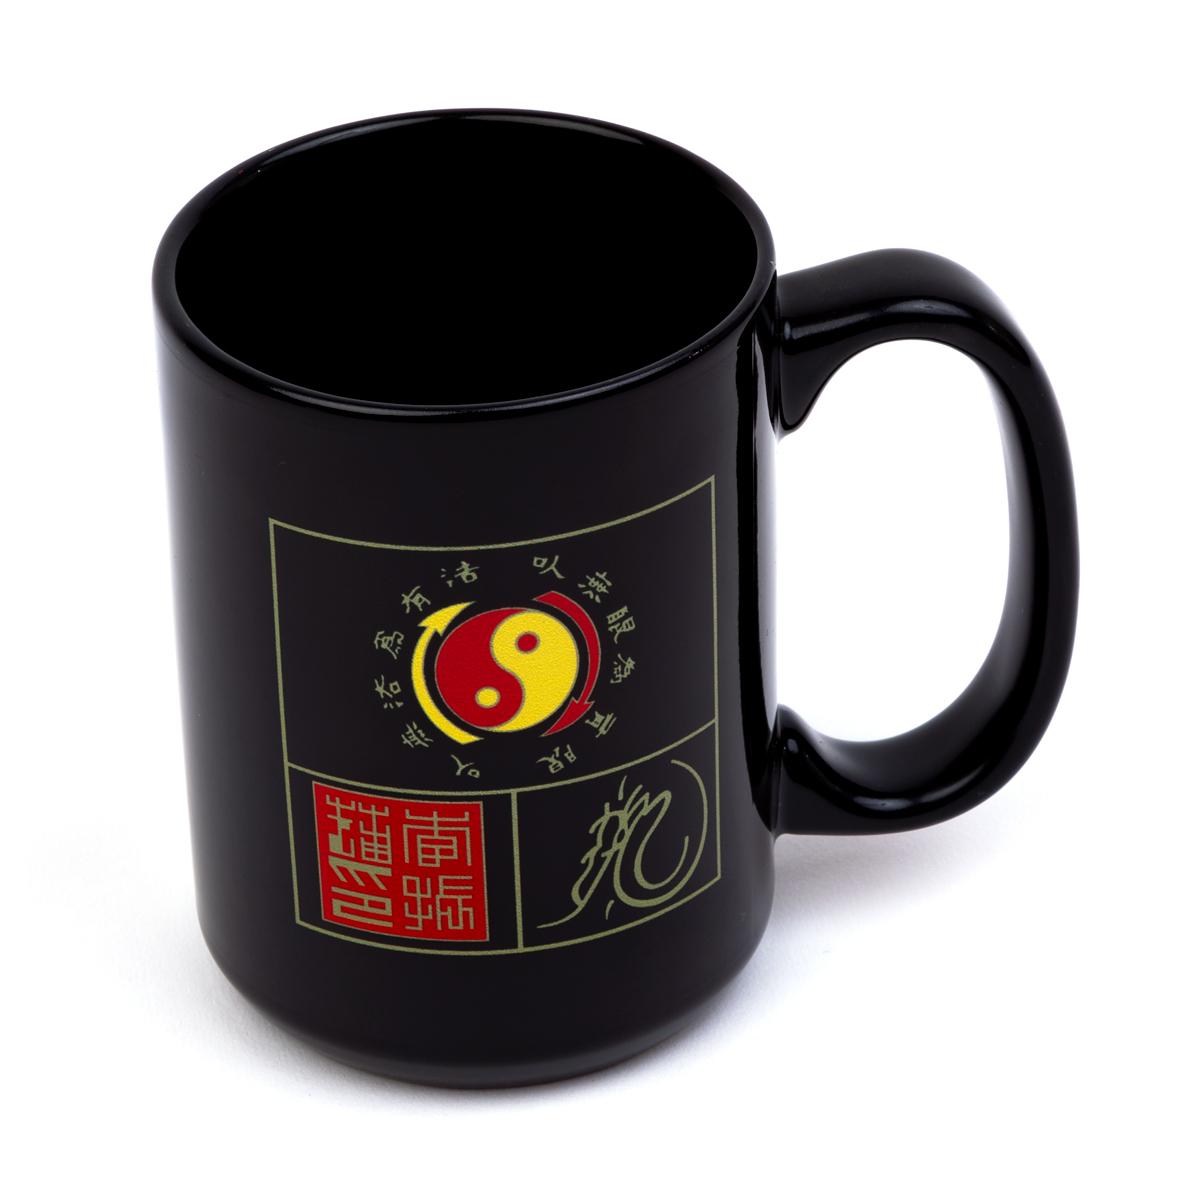 Jun Fan Jeet Kune Do 15oz. Mug